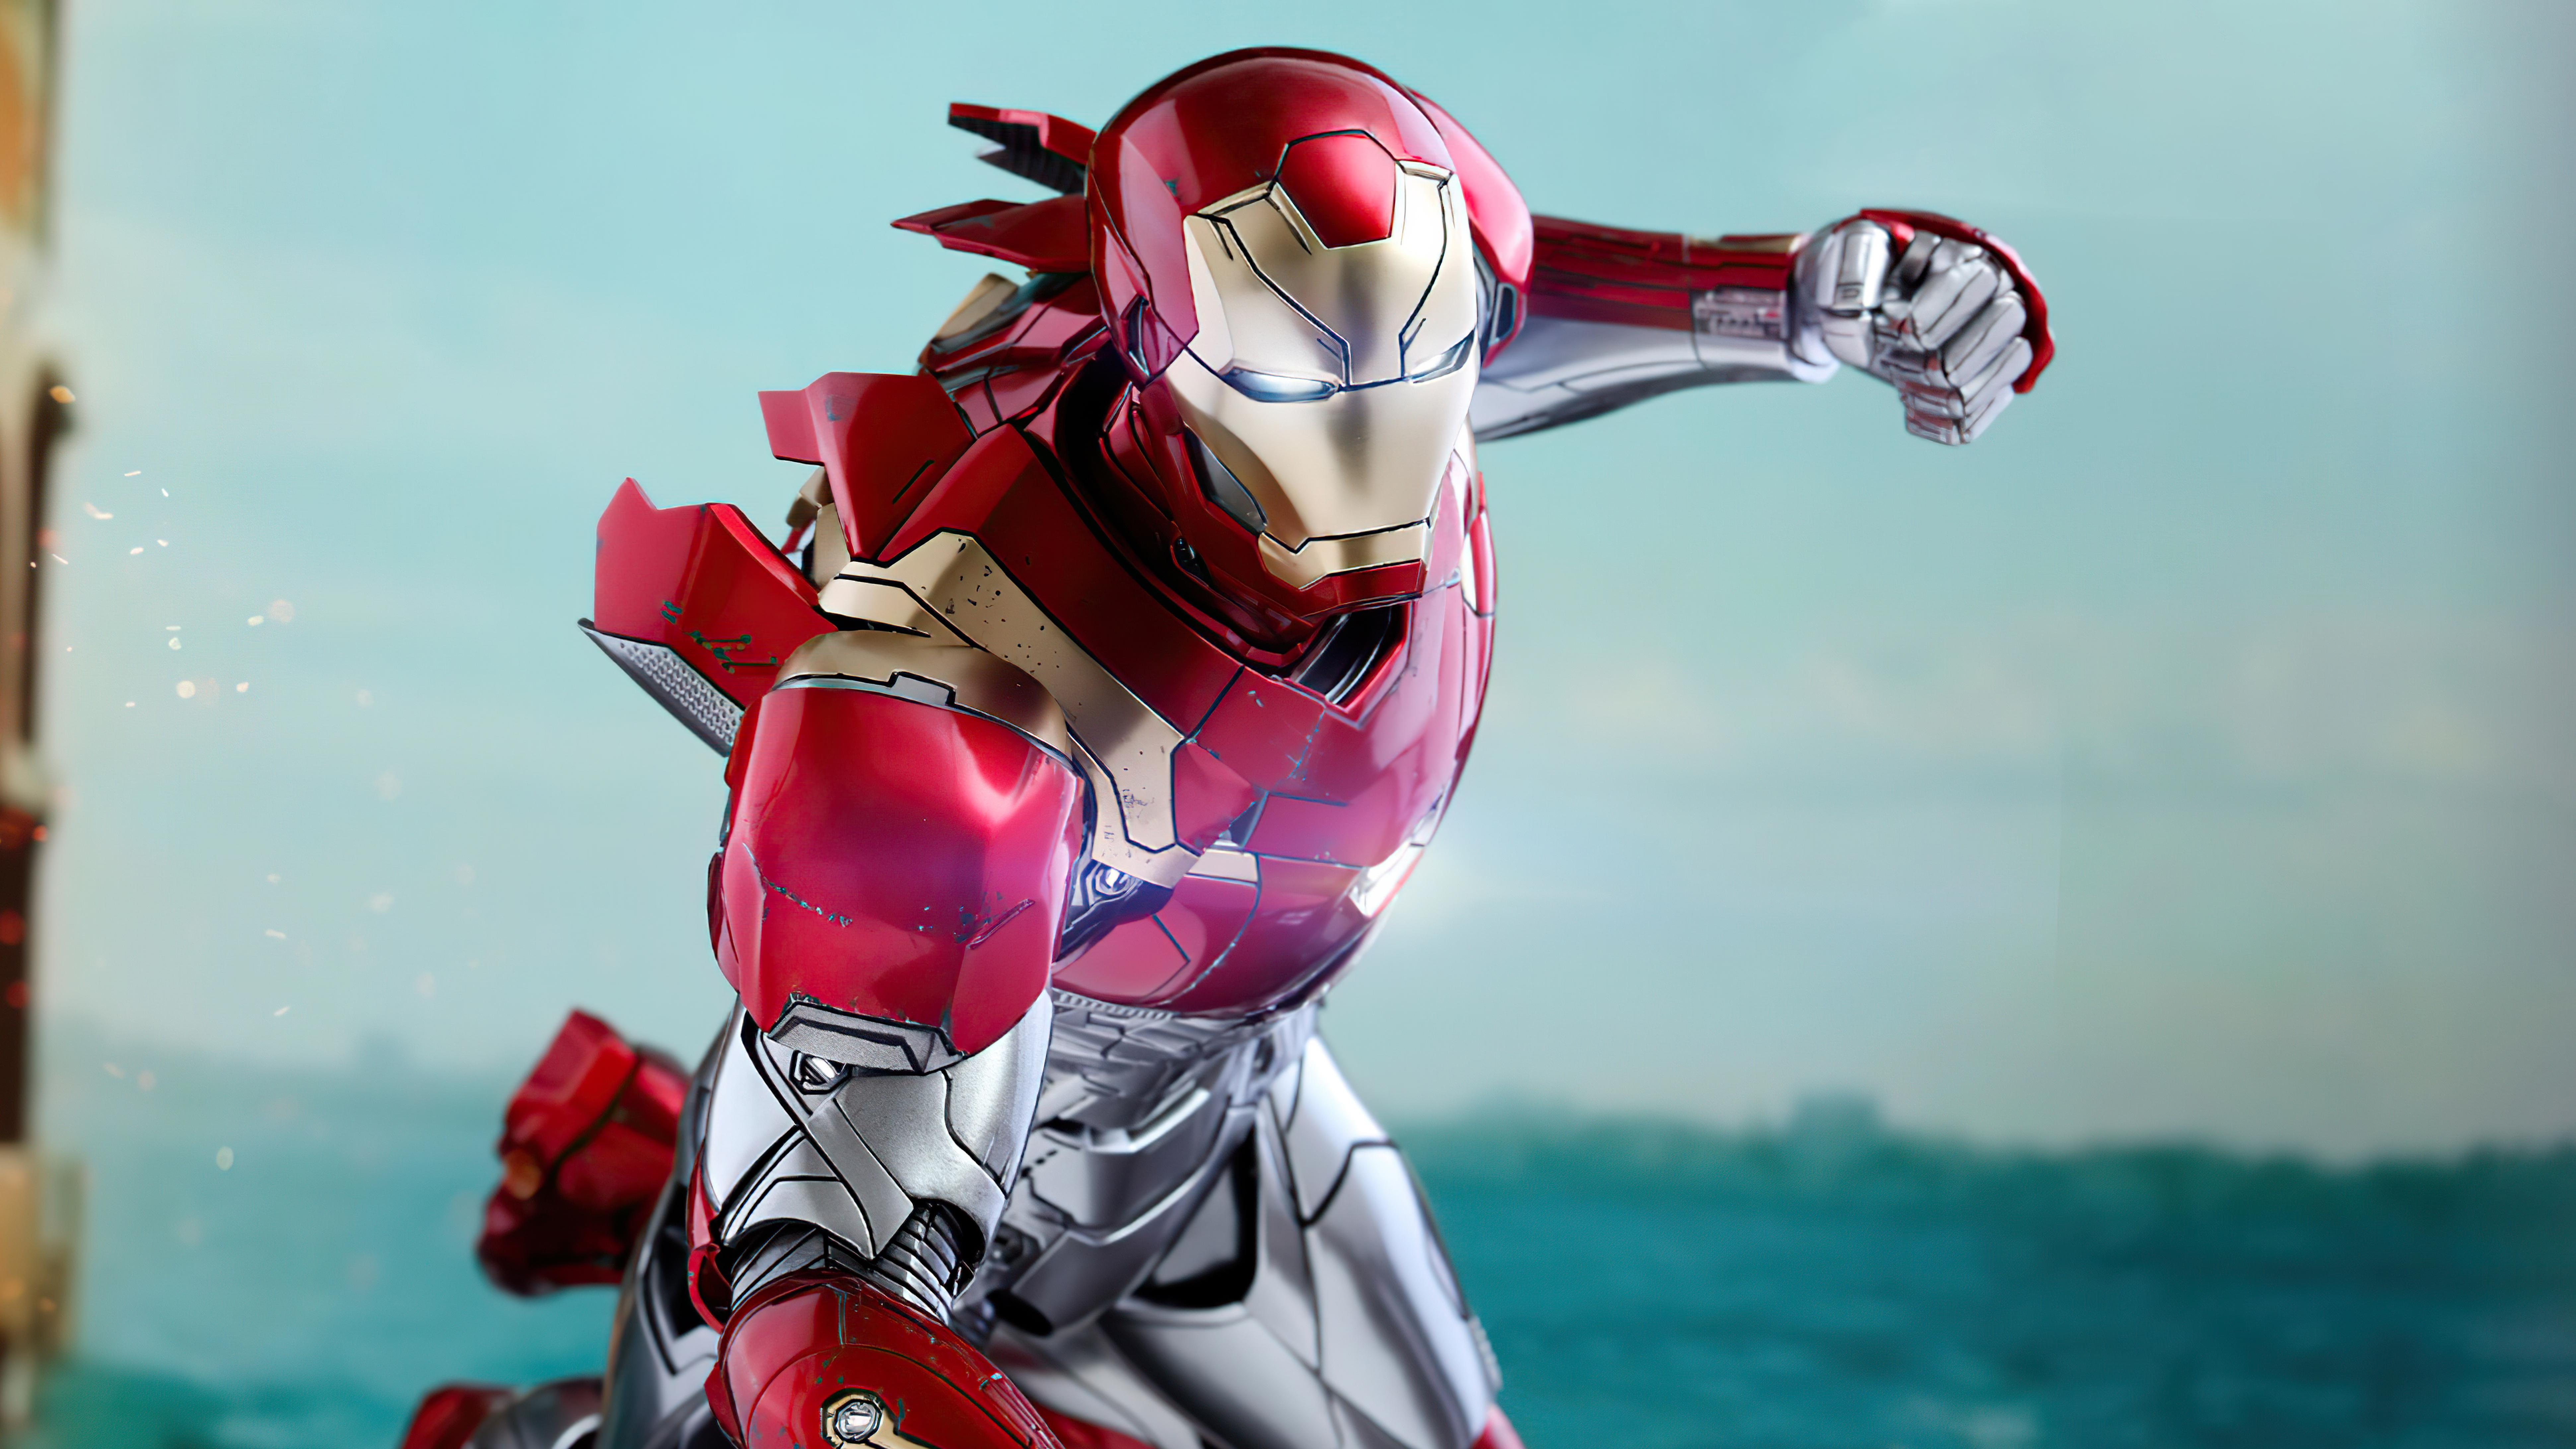 Wallpaper Iron Man Mark XLVII